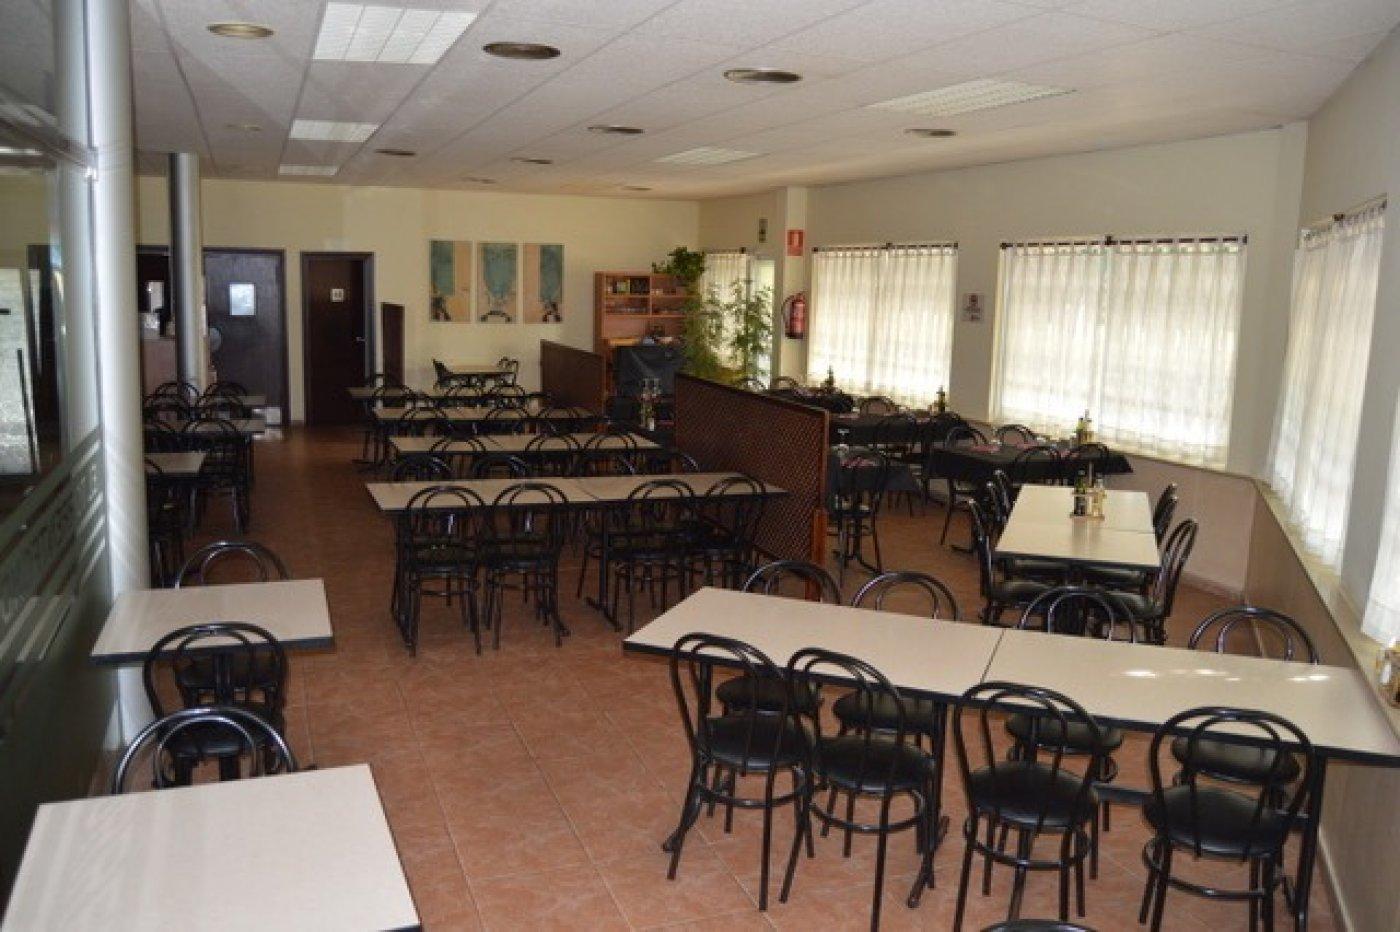 Nave restaurante en polígono cerca de sant sadurní d´anoia - imagenInmueble14